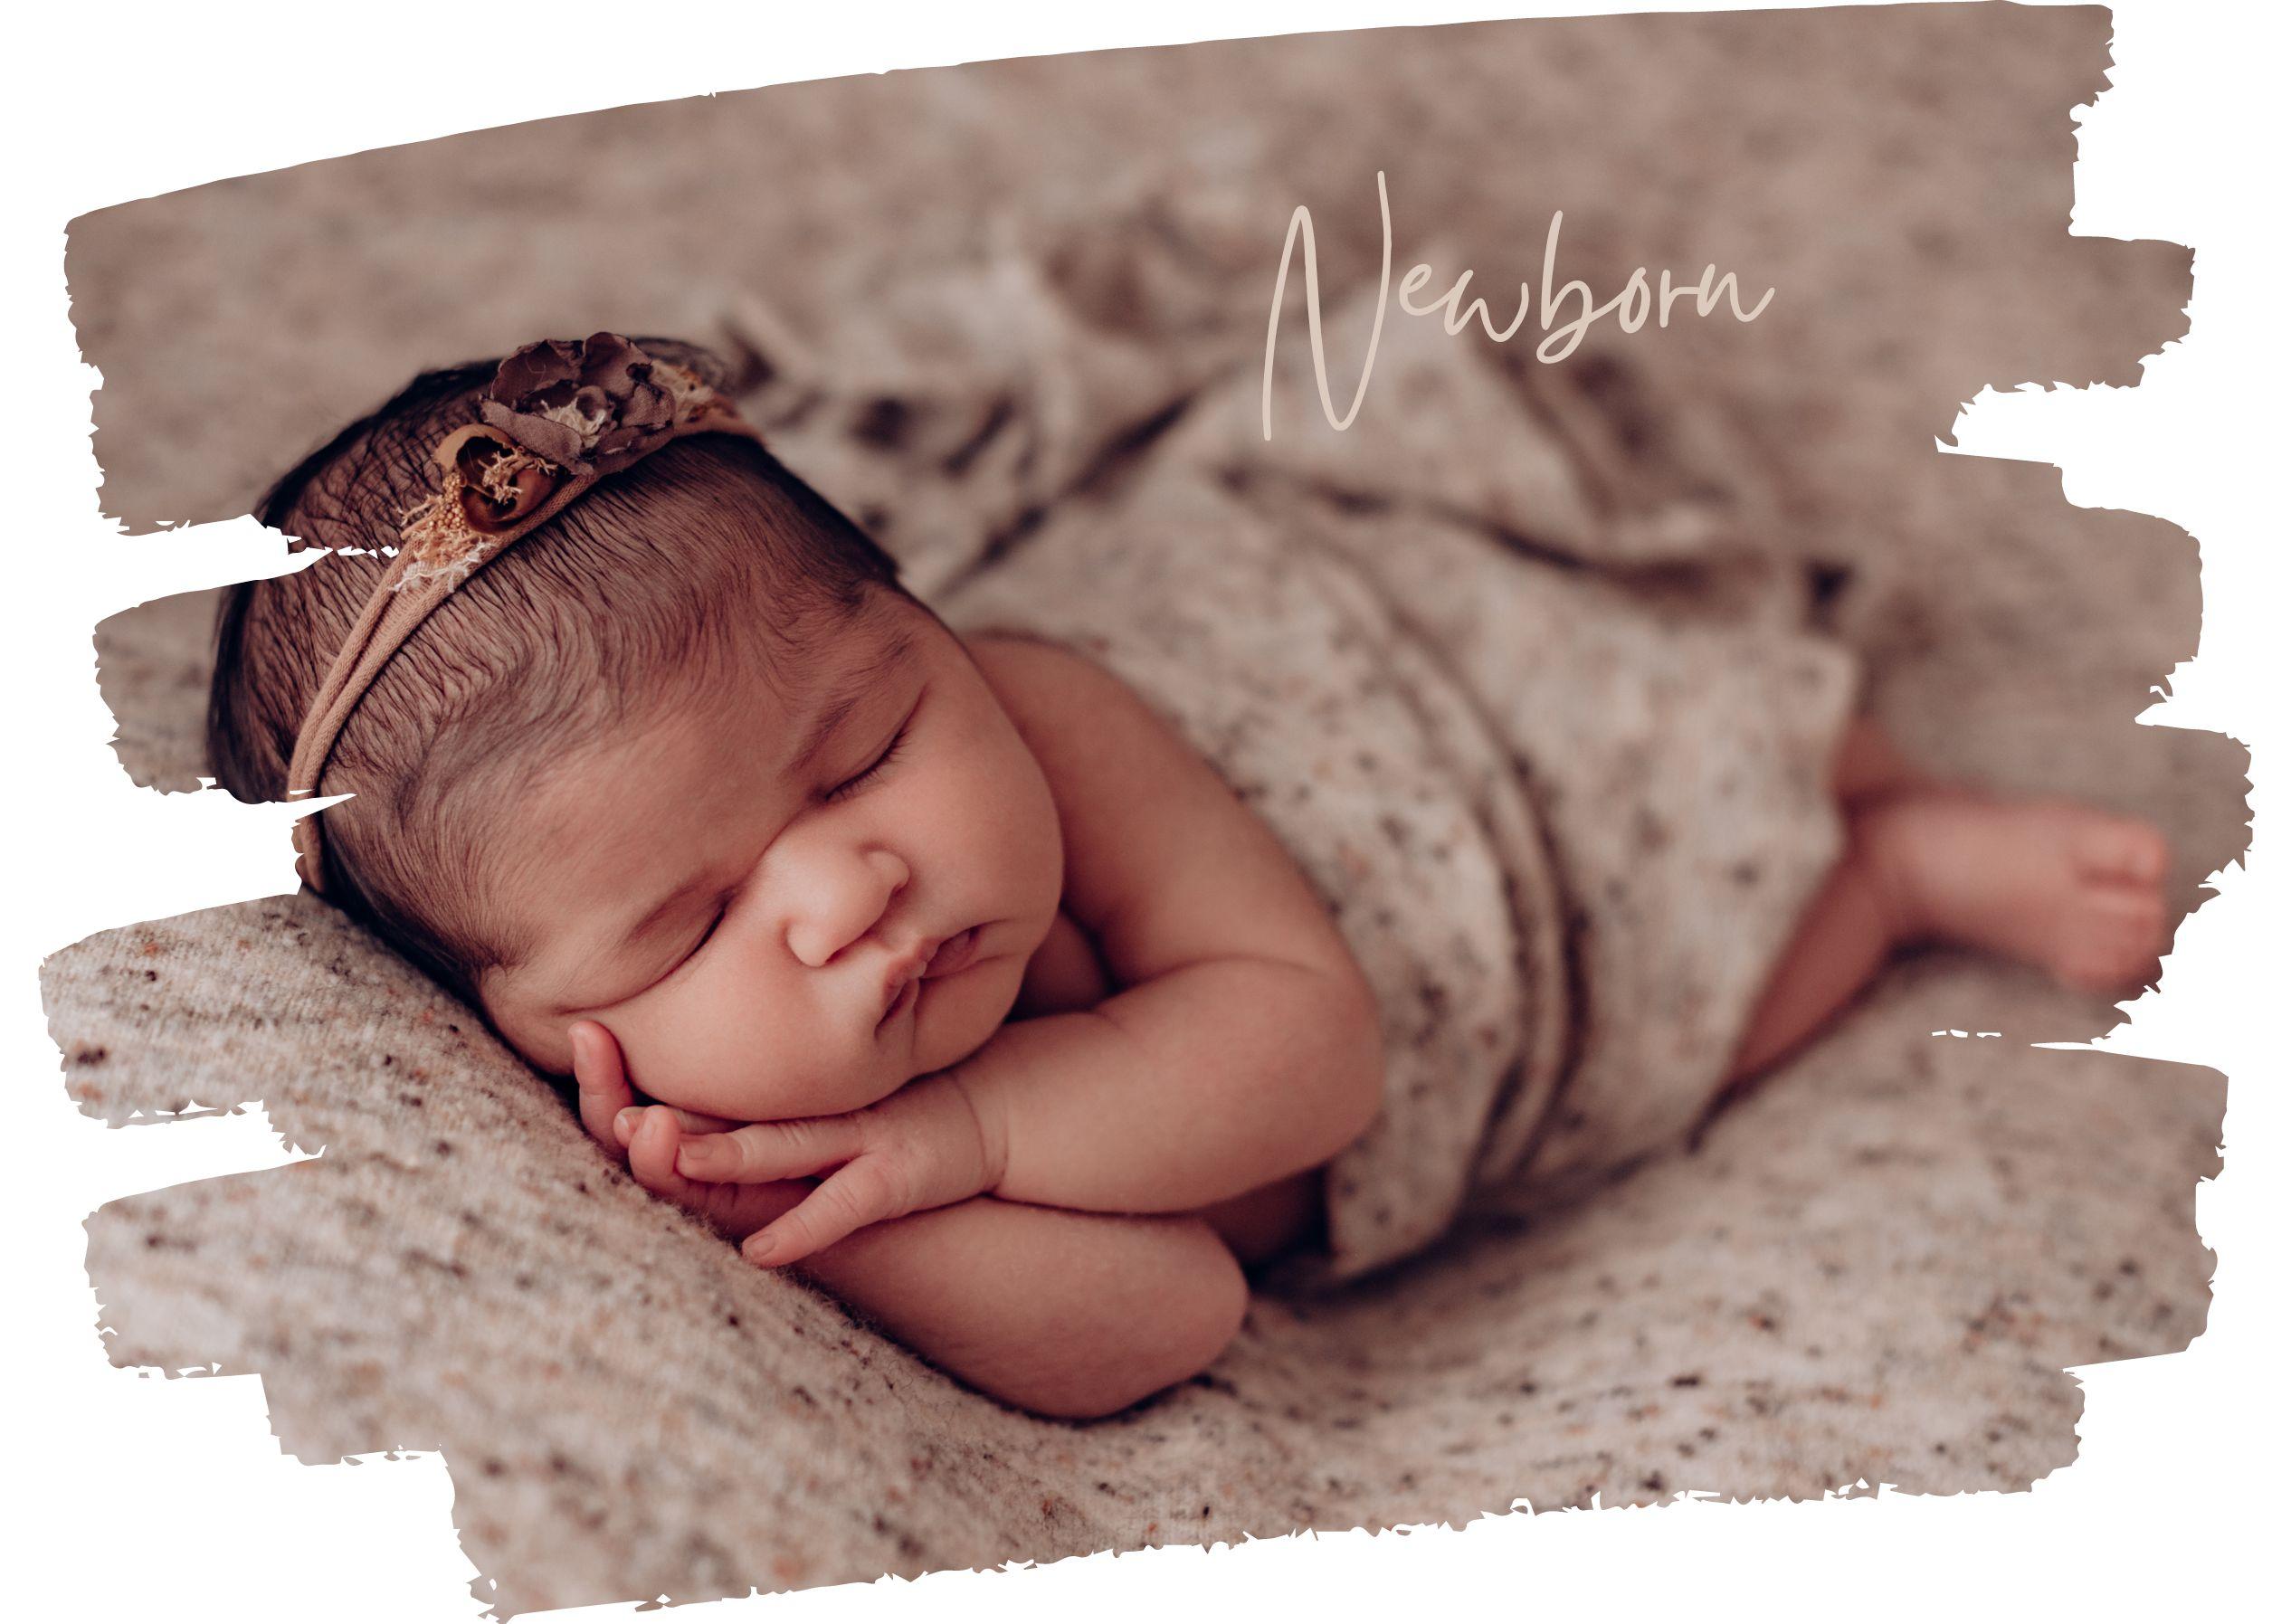 Neugeborenenfotograf Neugeborenenfotografie Neugeborenenfotos Neugeborenenbilder Neugeborenenfotoshooting Neugeborene Newbornfotograf Newbornfotografie Newbornfotos Newbornbilder Newbornfotoshooting Newborn